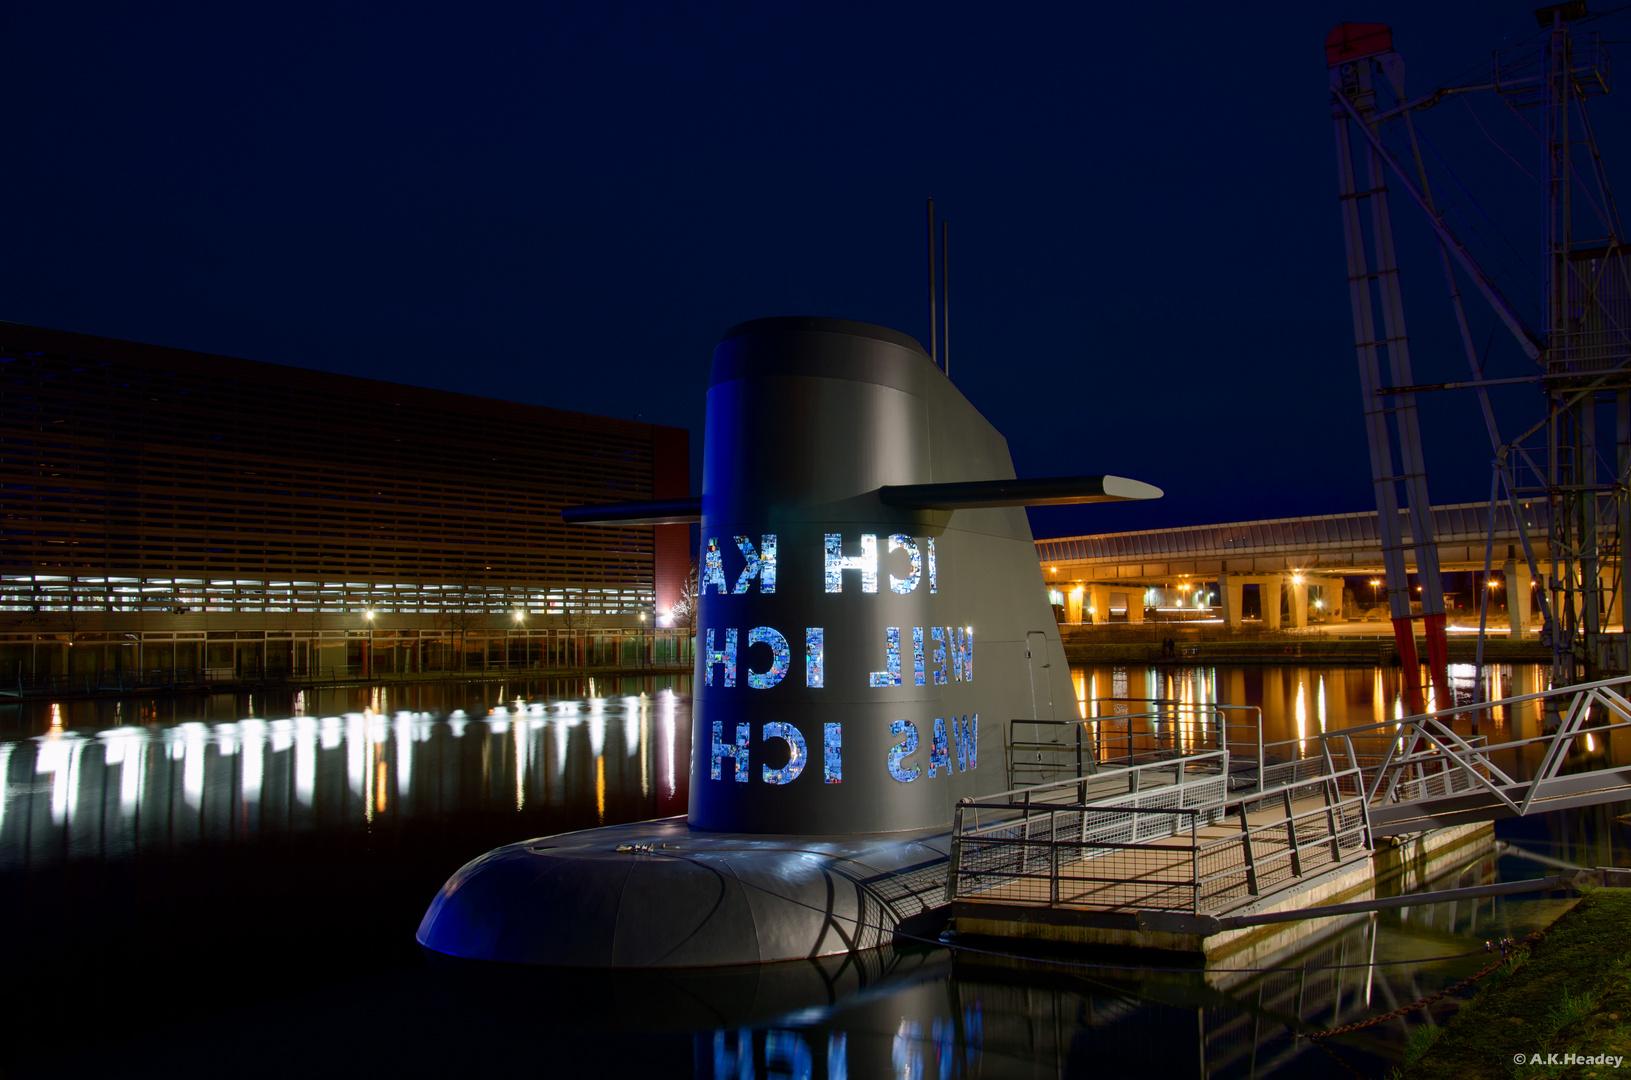 U-Boot im Duisburger Hafen